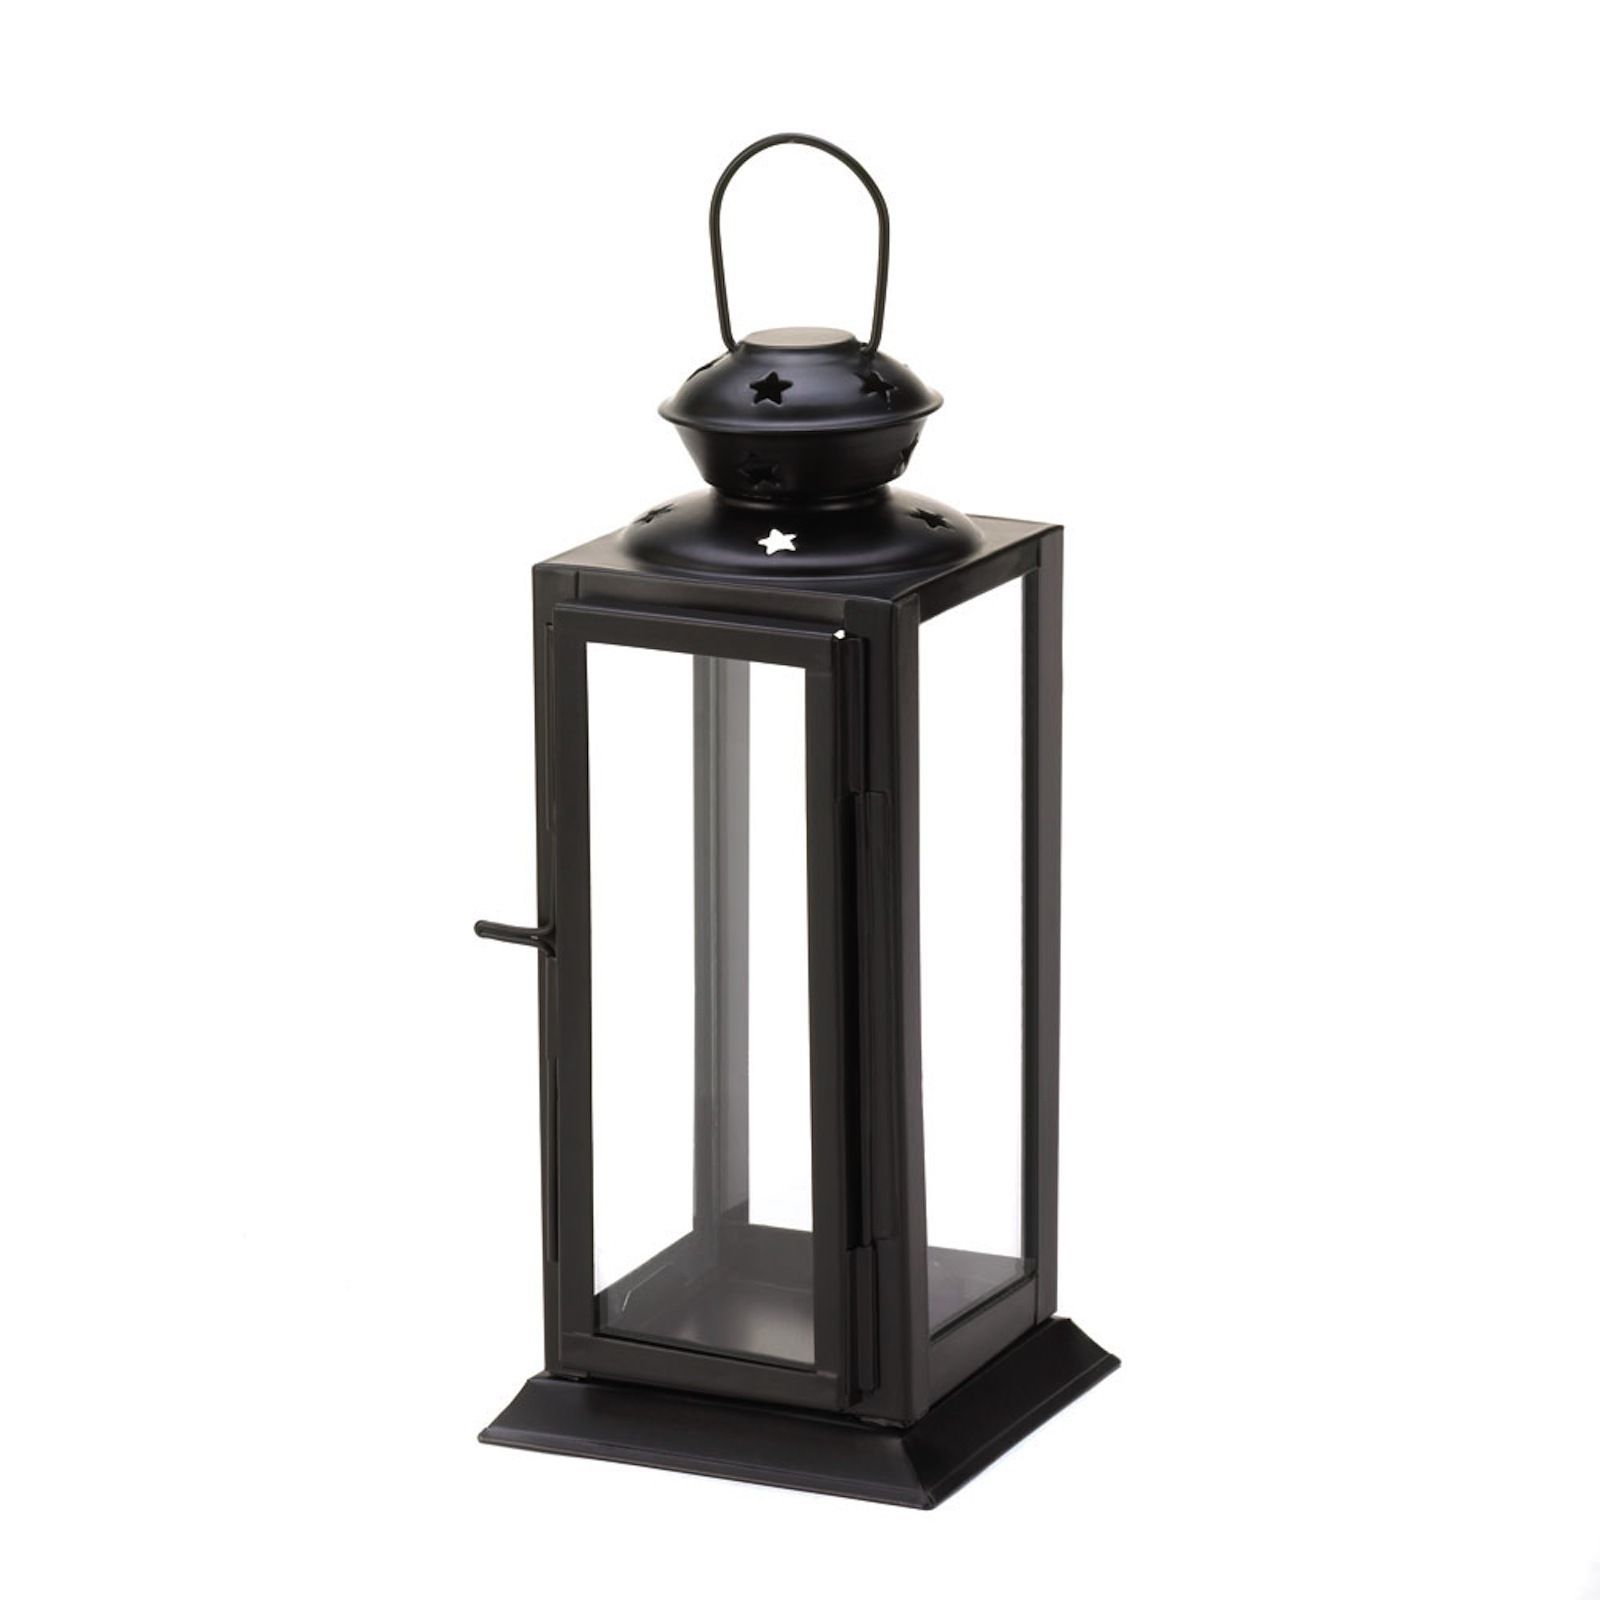 30 BLACK Lantern Candle Holder WEDDING Centerpieces image 2